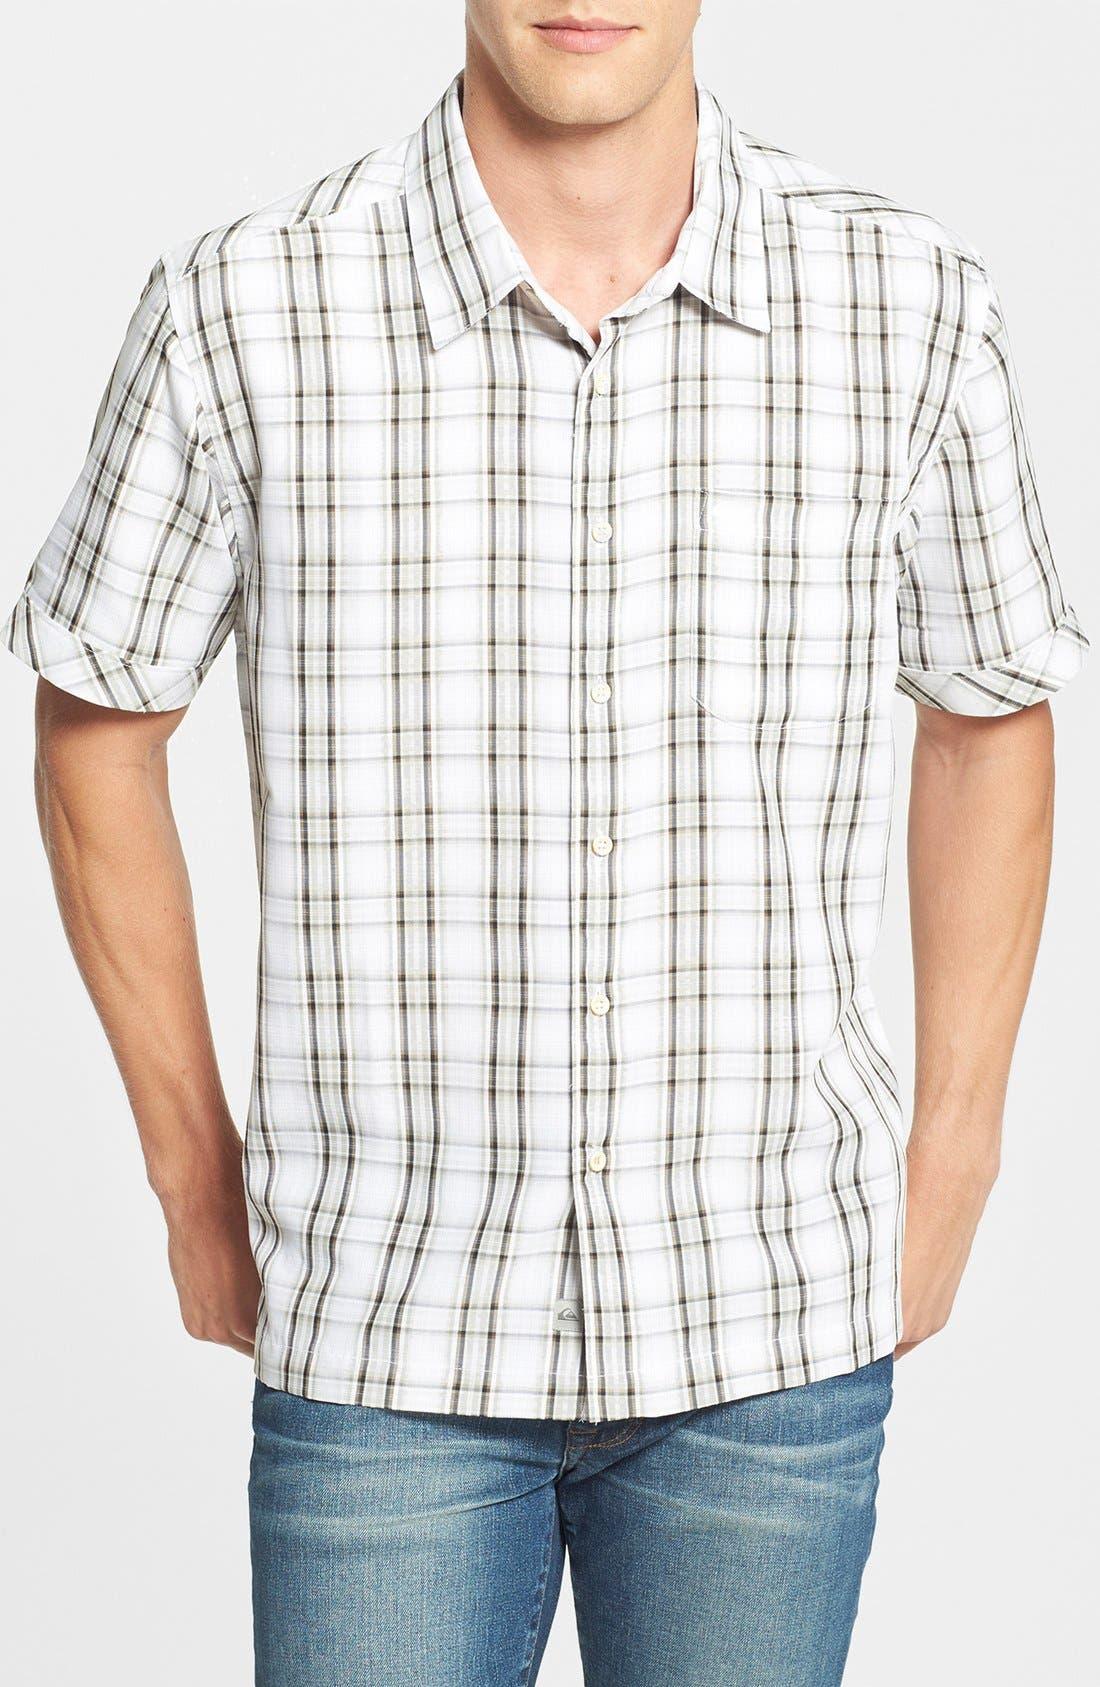 Main Image - Quiksilver Waterman Collection 'Seal Rocks' Regular Fit Sport Shirt